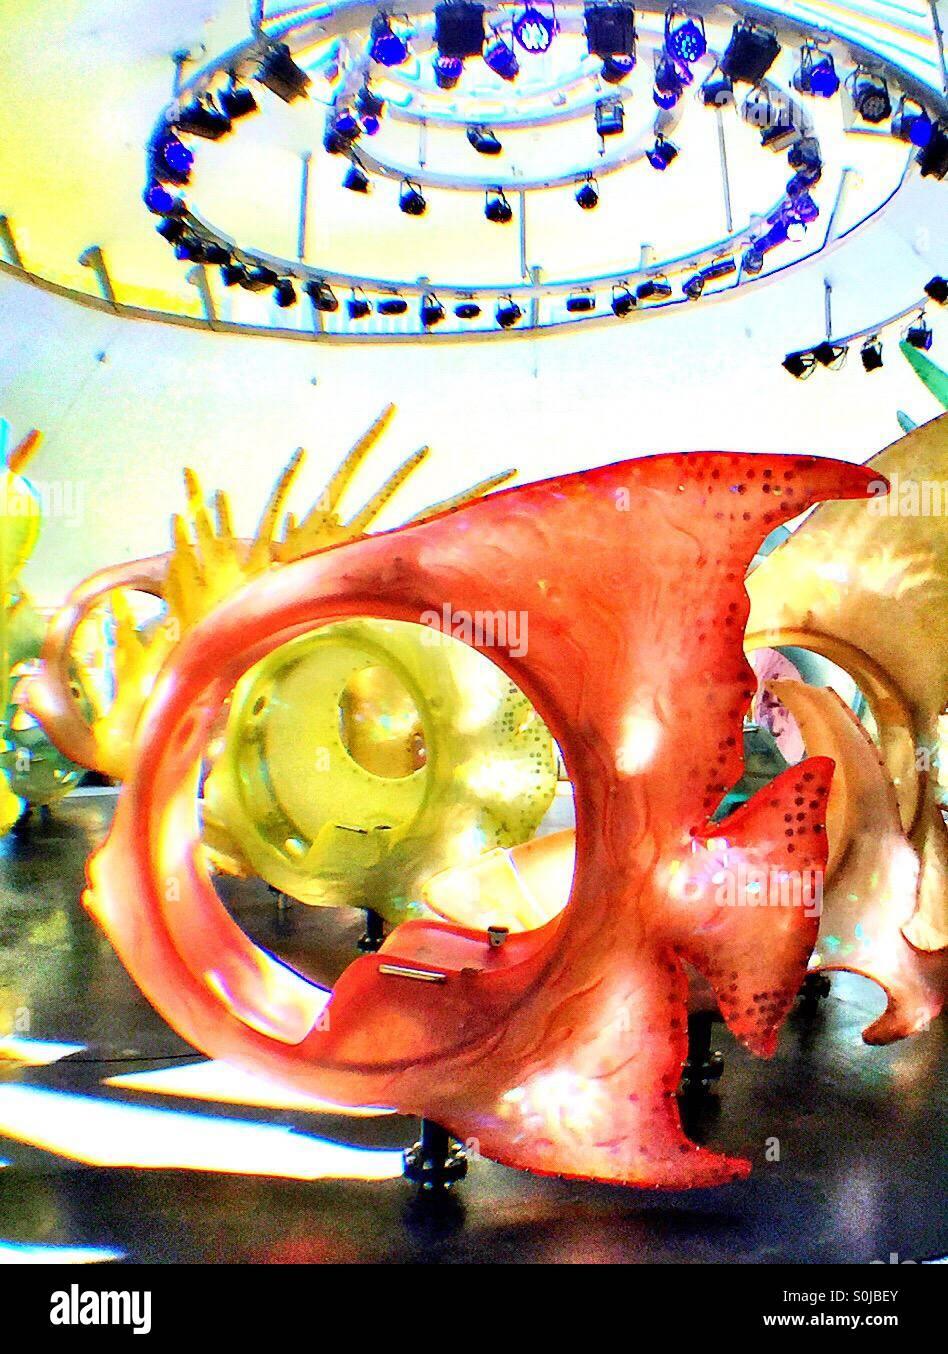 Brightly colored fiberglass fish ride at the Seaglass carousel in ...